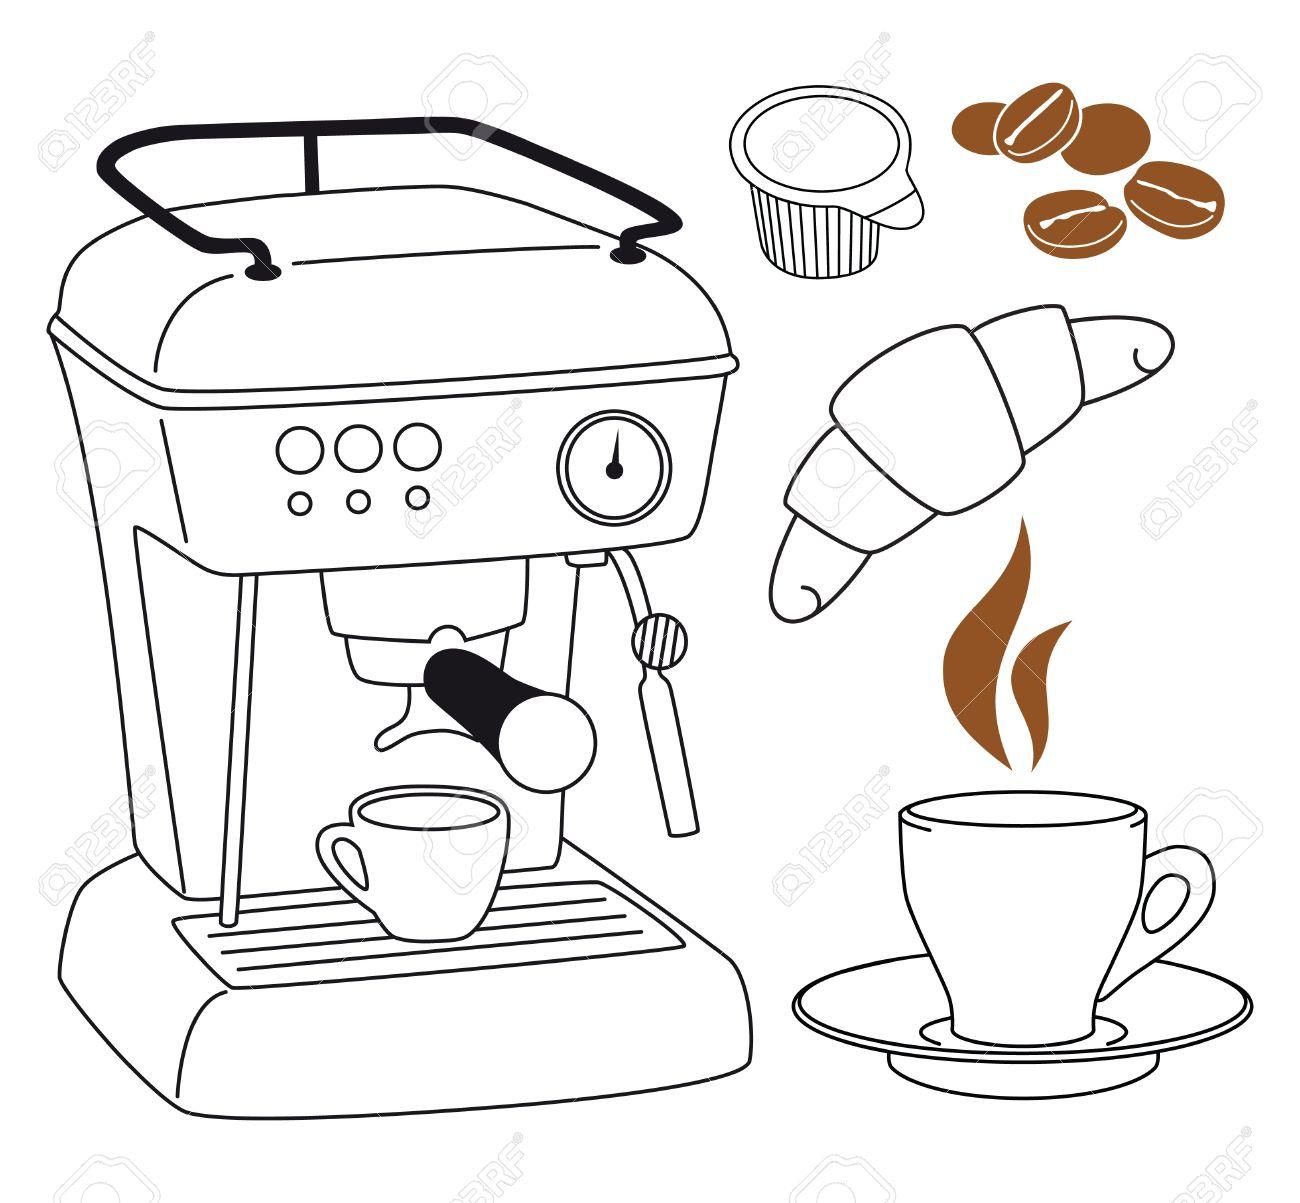 Espresso Coffee Machine Clip Art Set Royalty Free Cliparts.